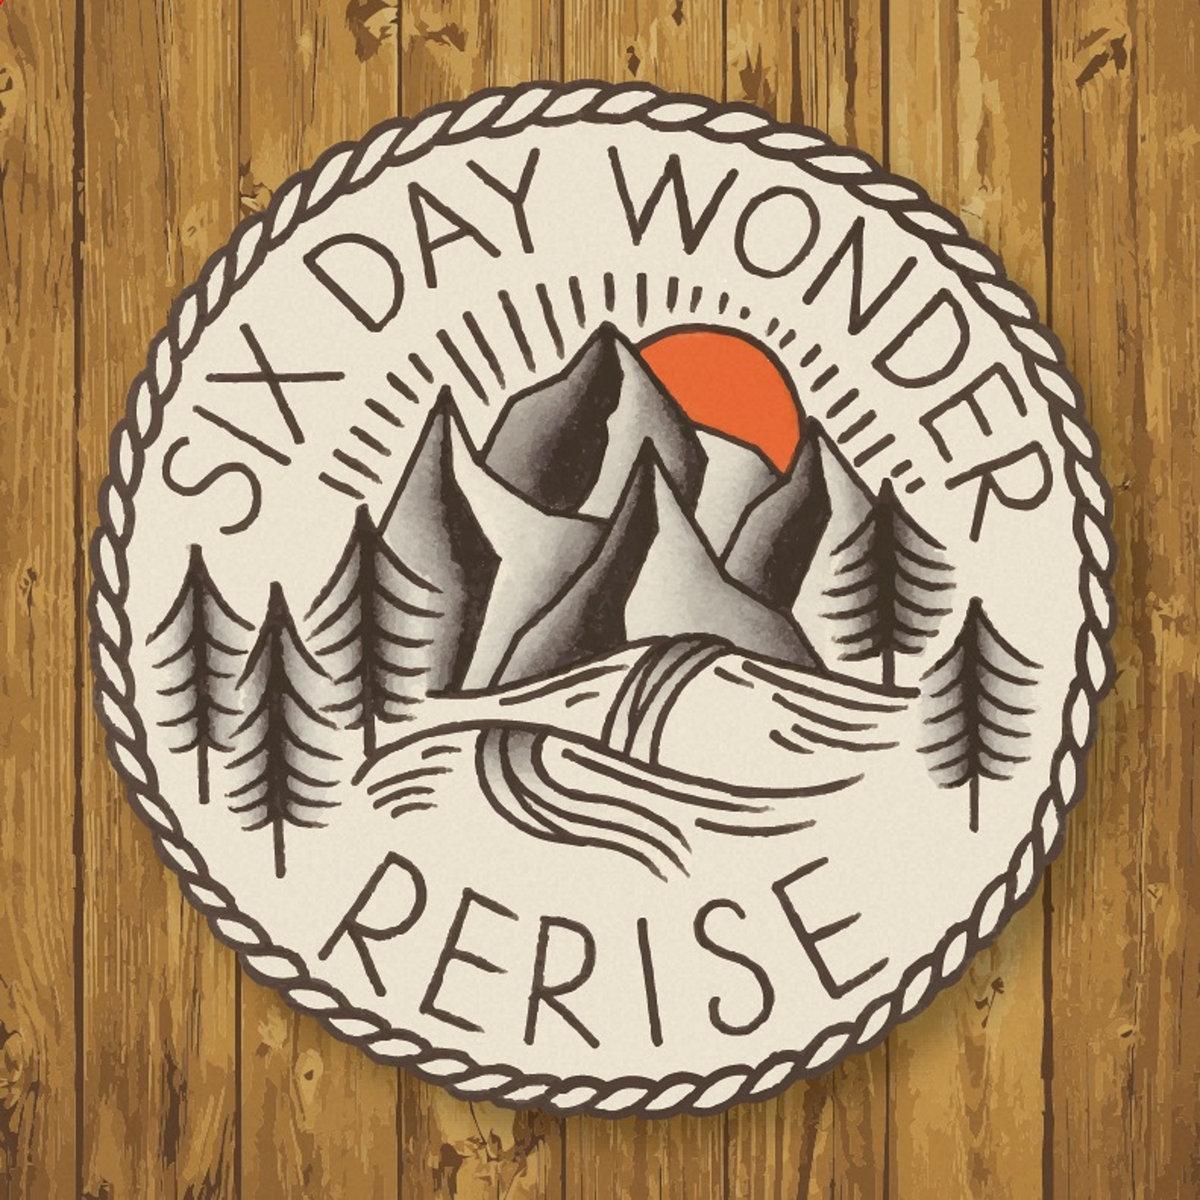 SIX DAY WONDER - RERISE [EP] (2016)